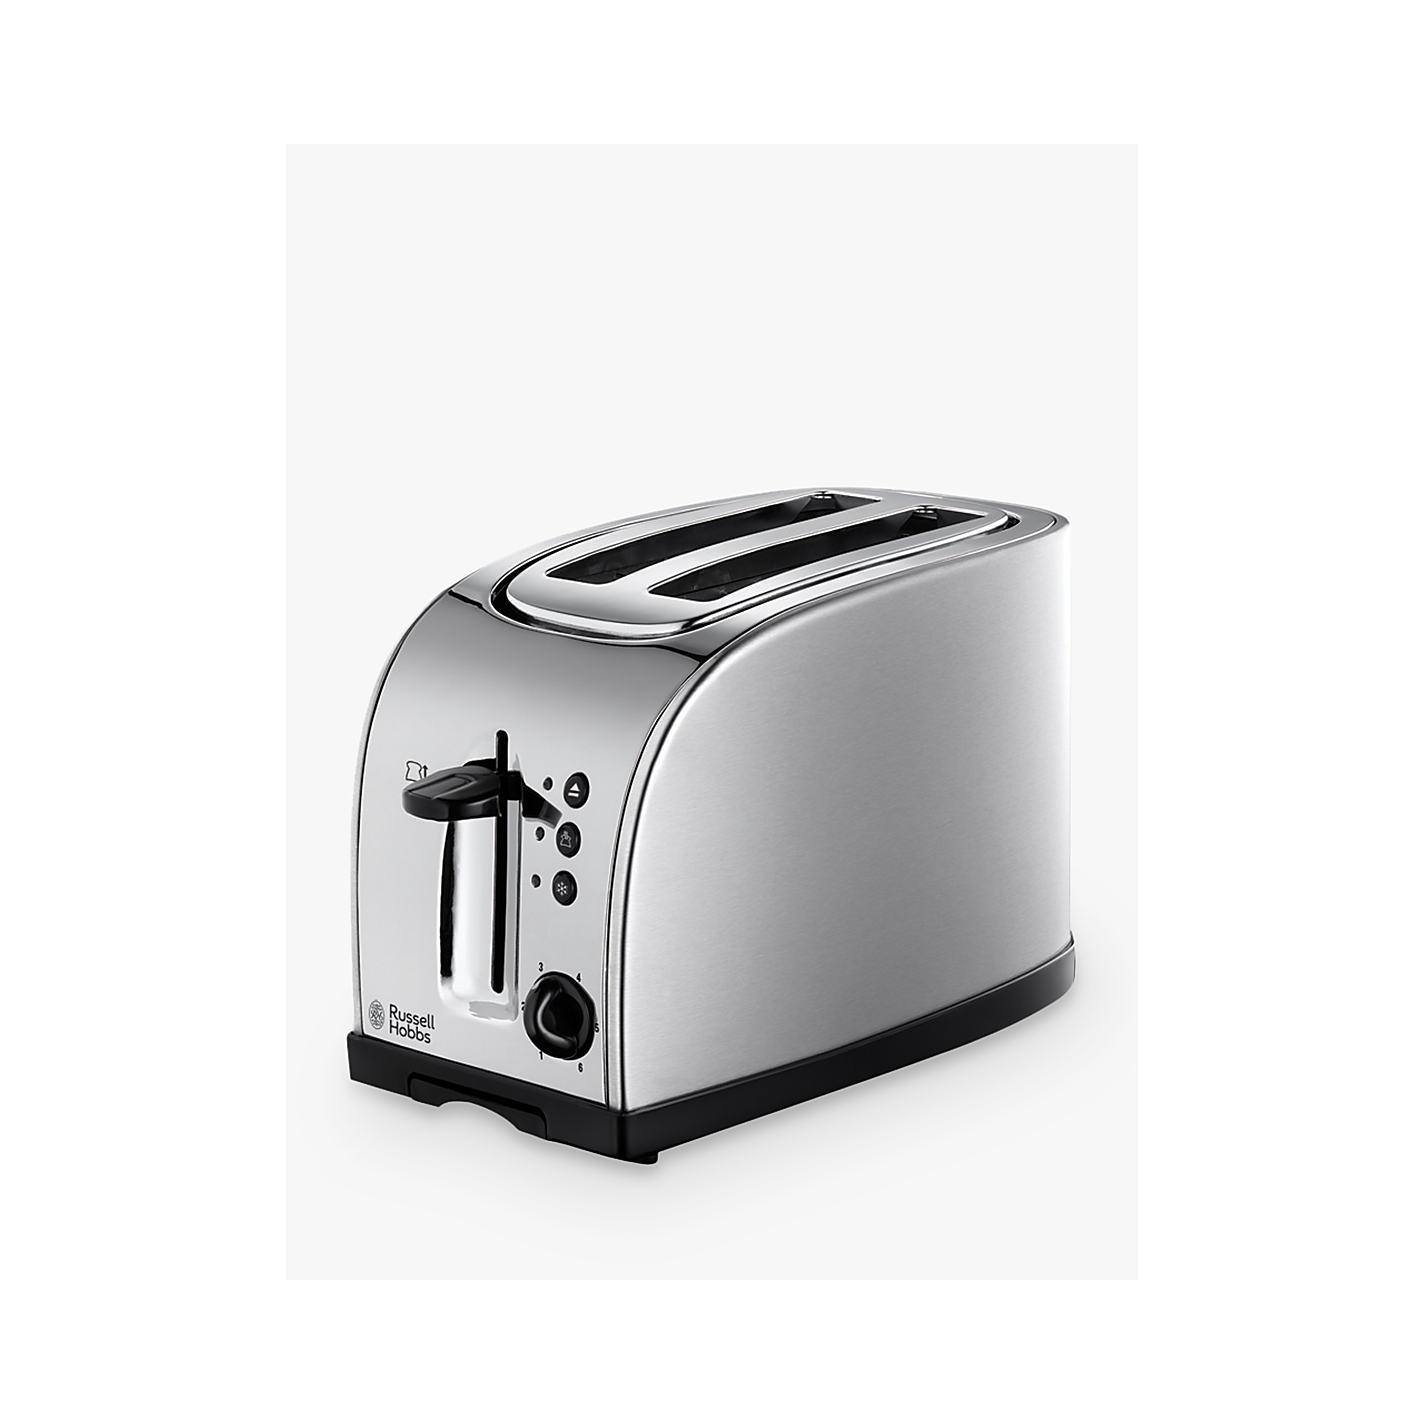 Buy Russell Hobbs 2 Slice Toaster Silver